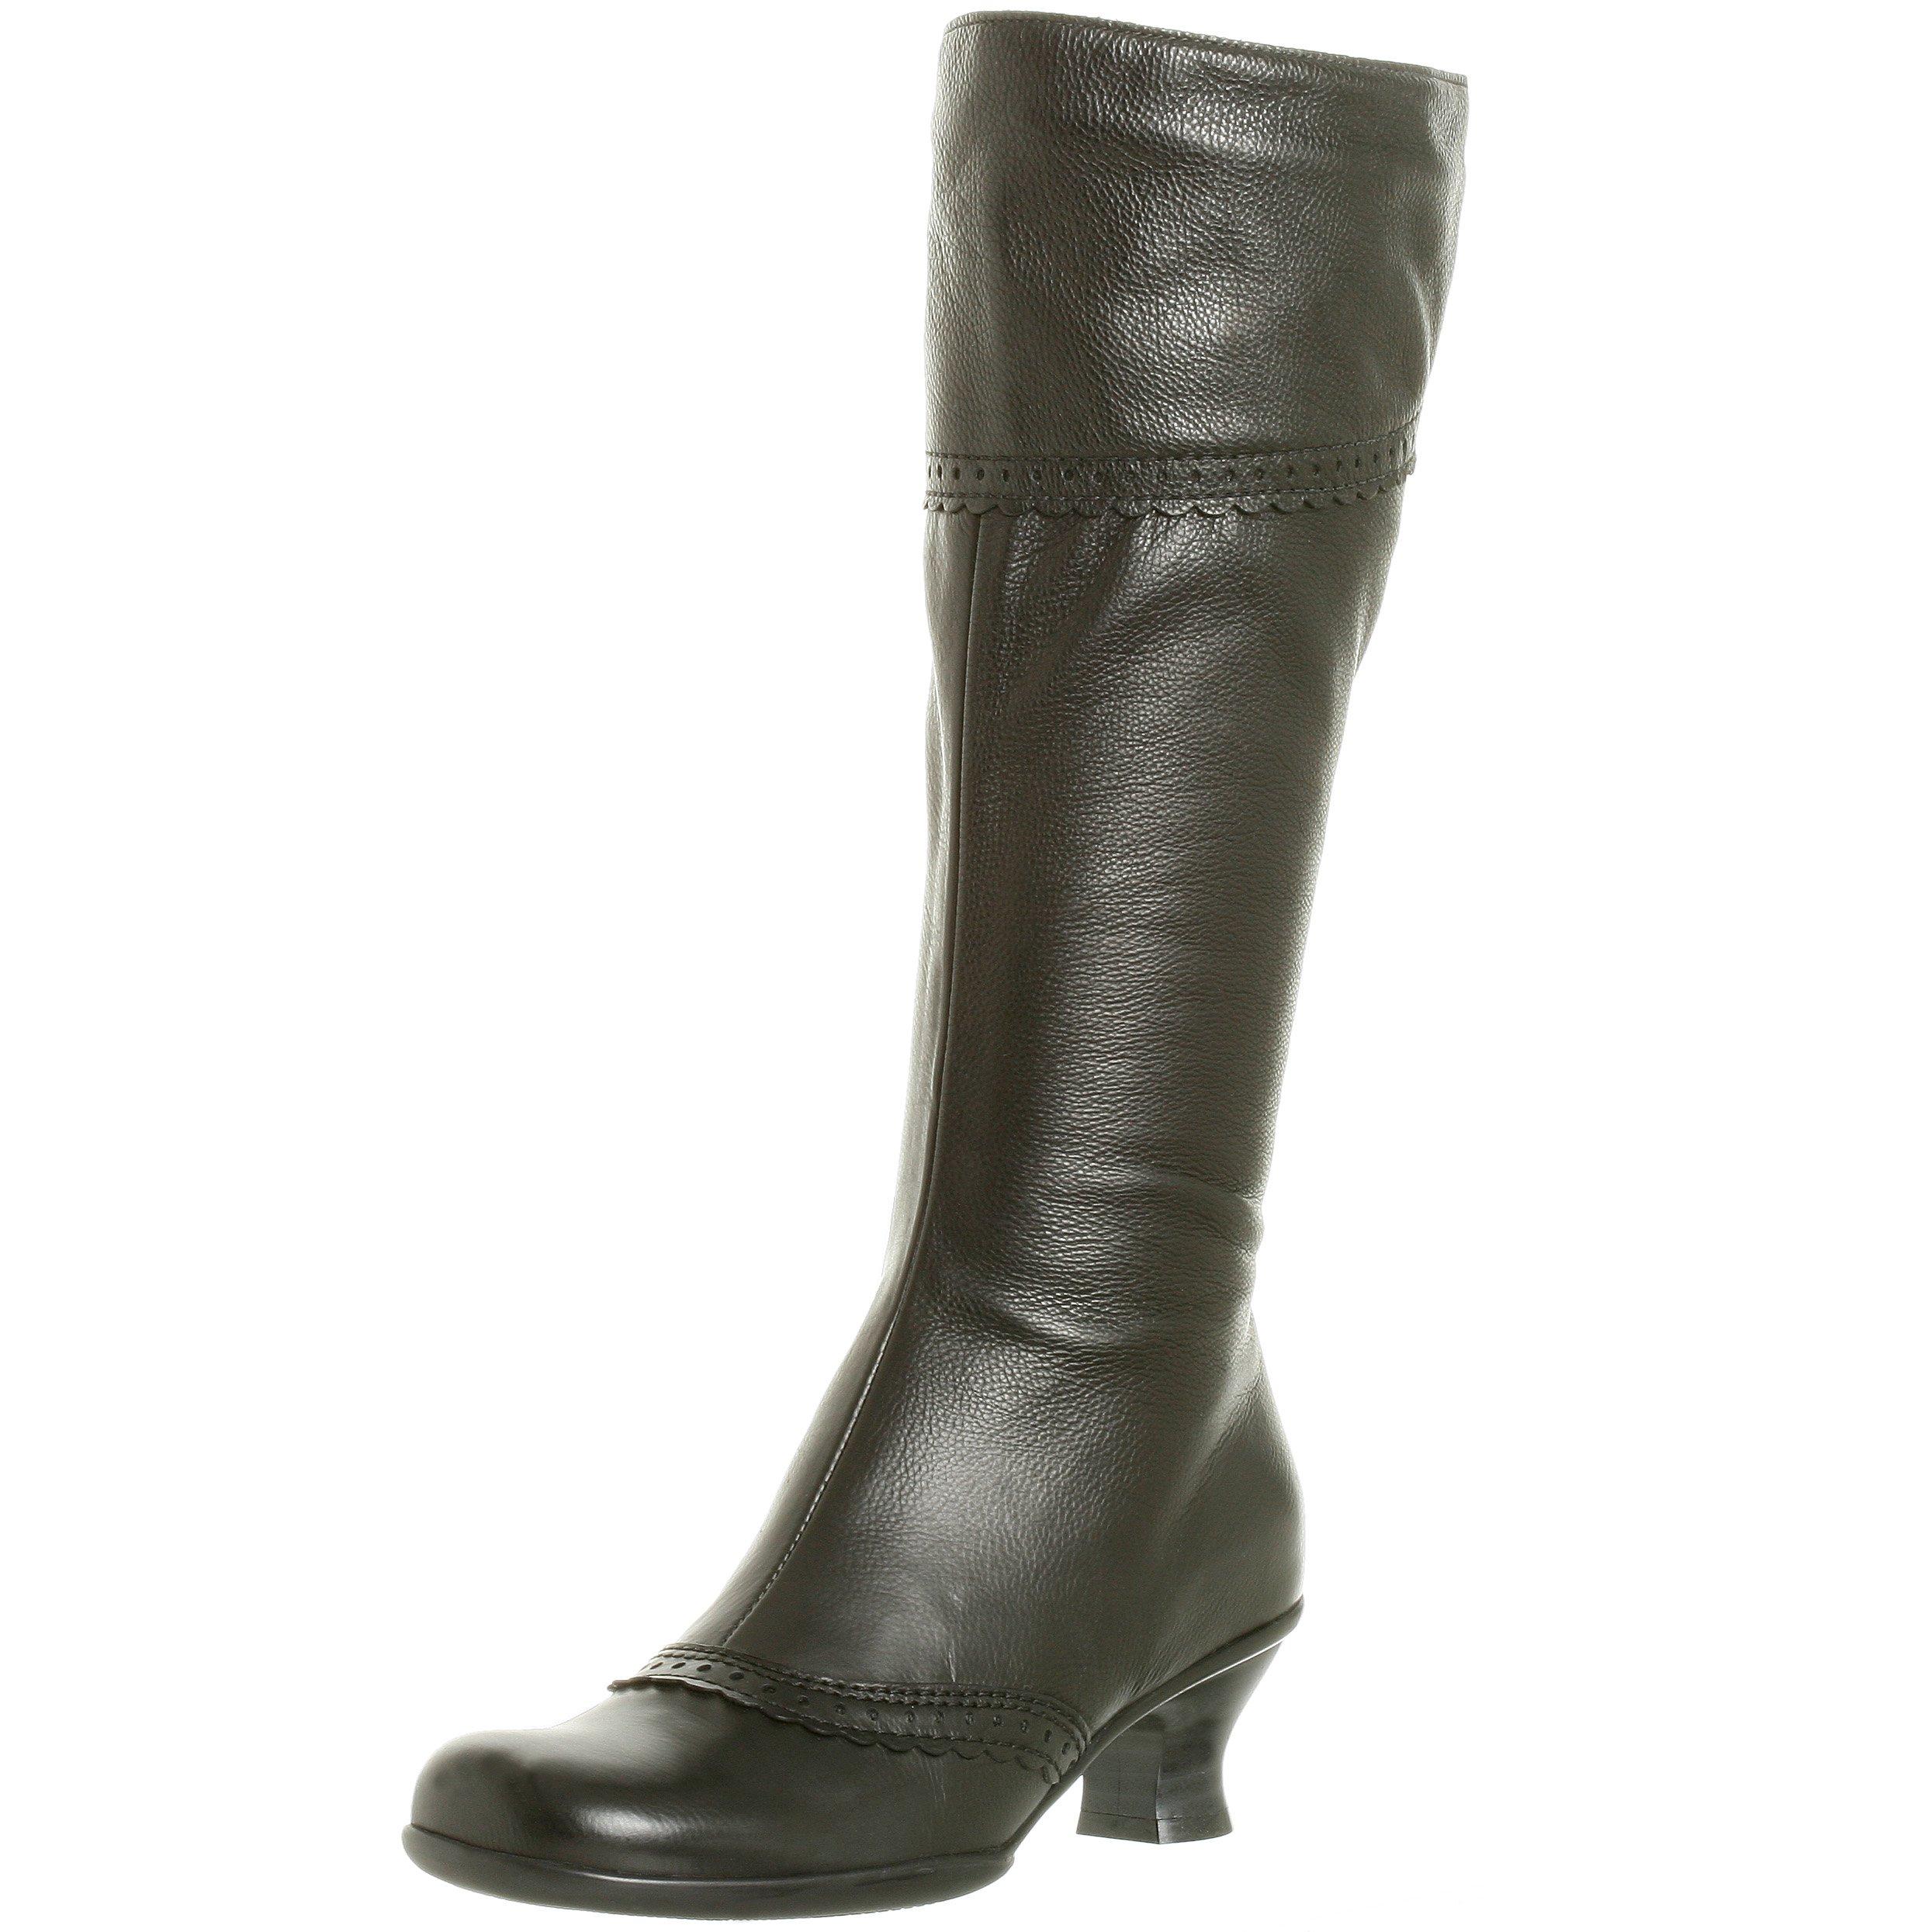 La Canadienne Women's Tahra Leather Boot,Black,6 M